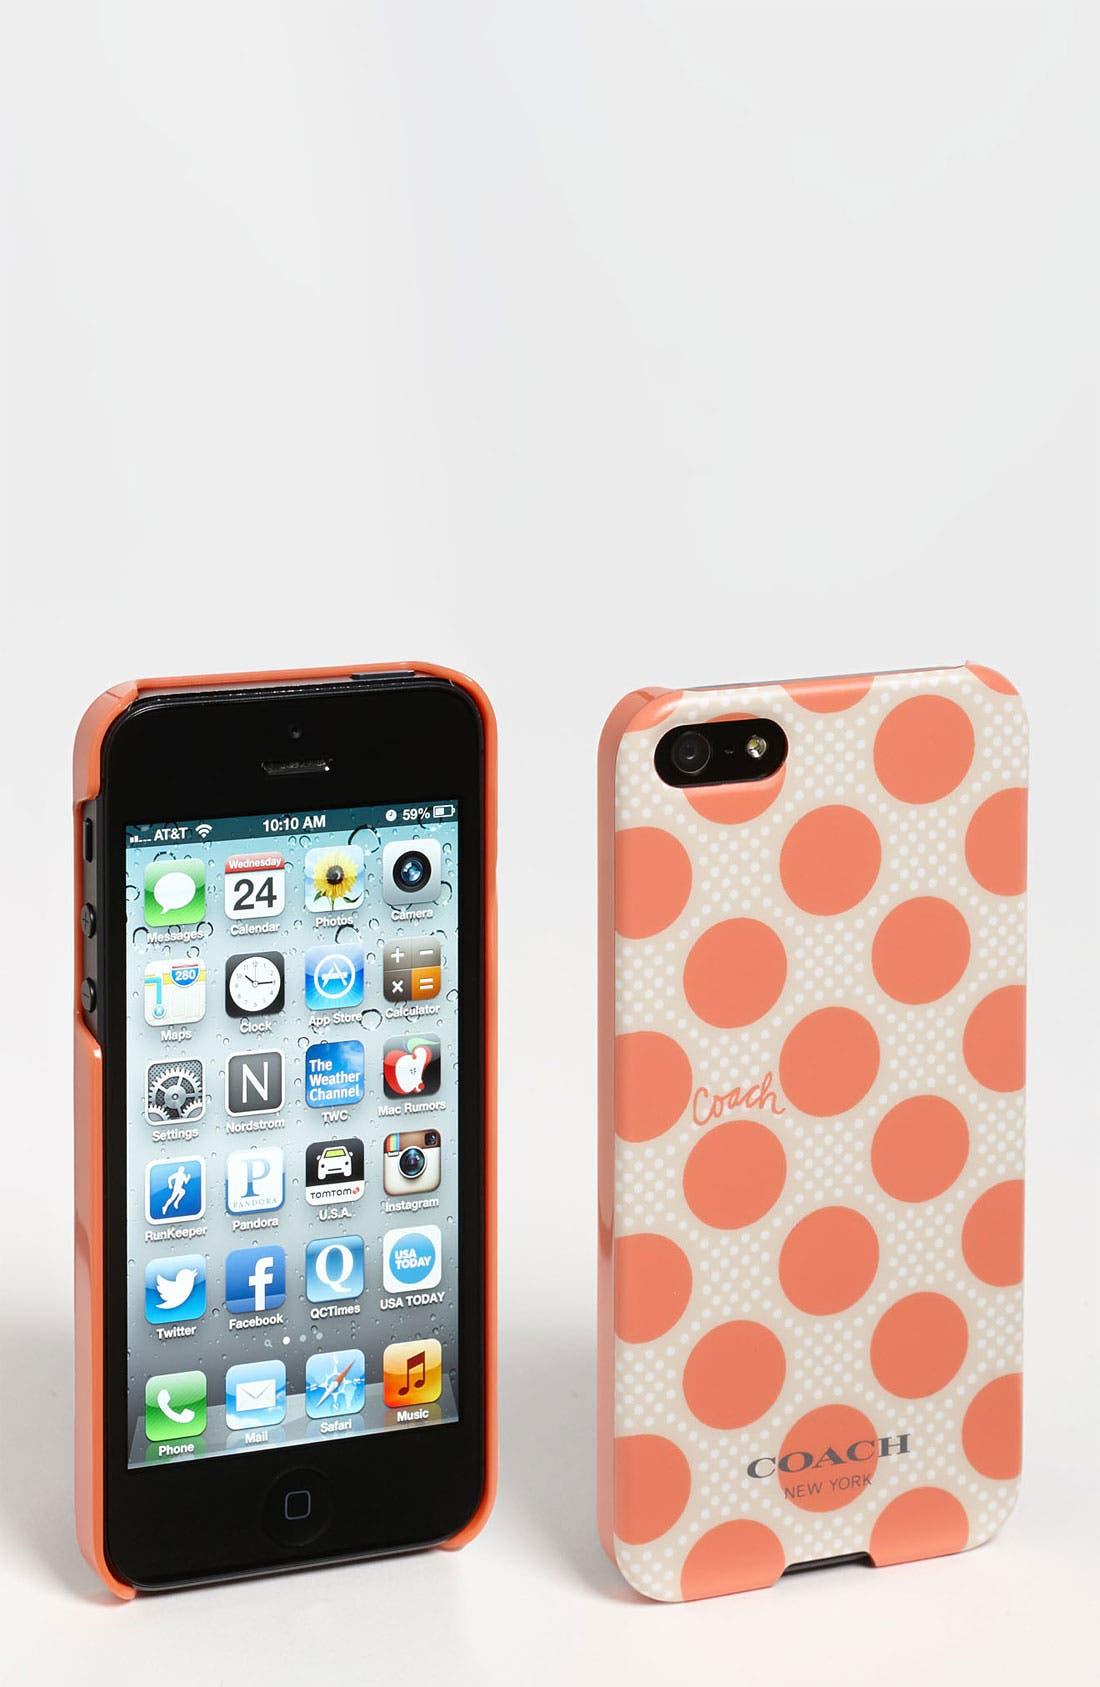 Main Image - COACH 'Polka Dot' iPhone 5 Case